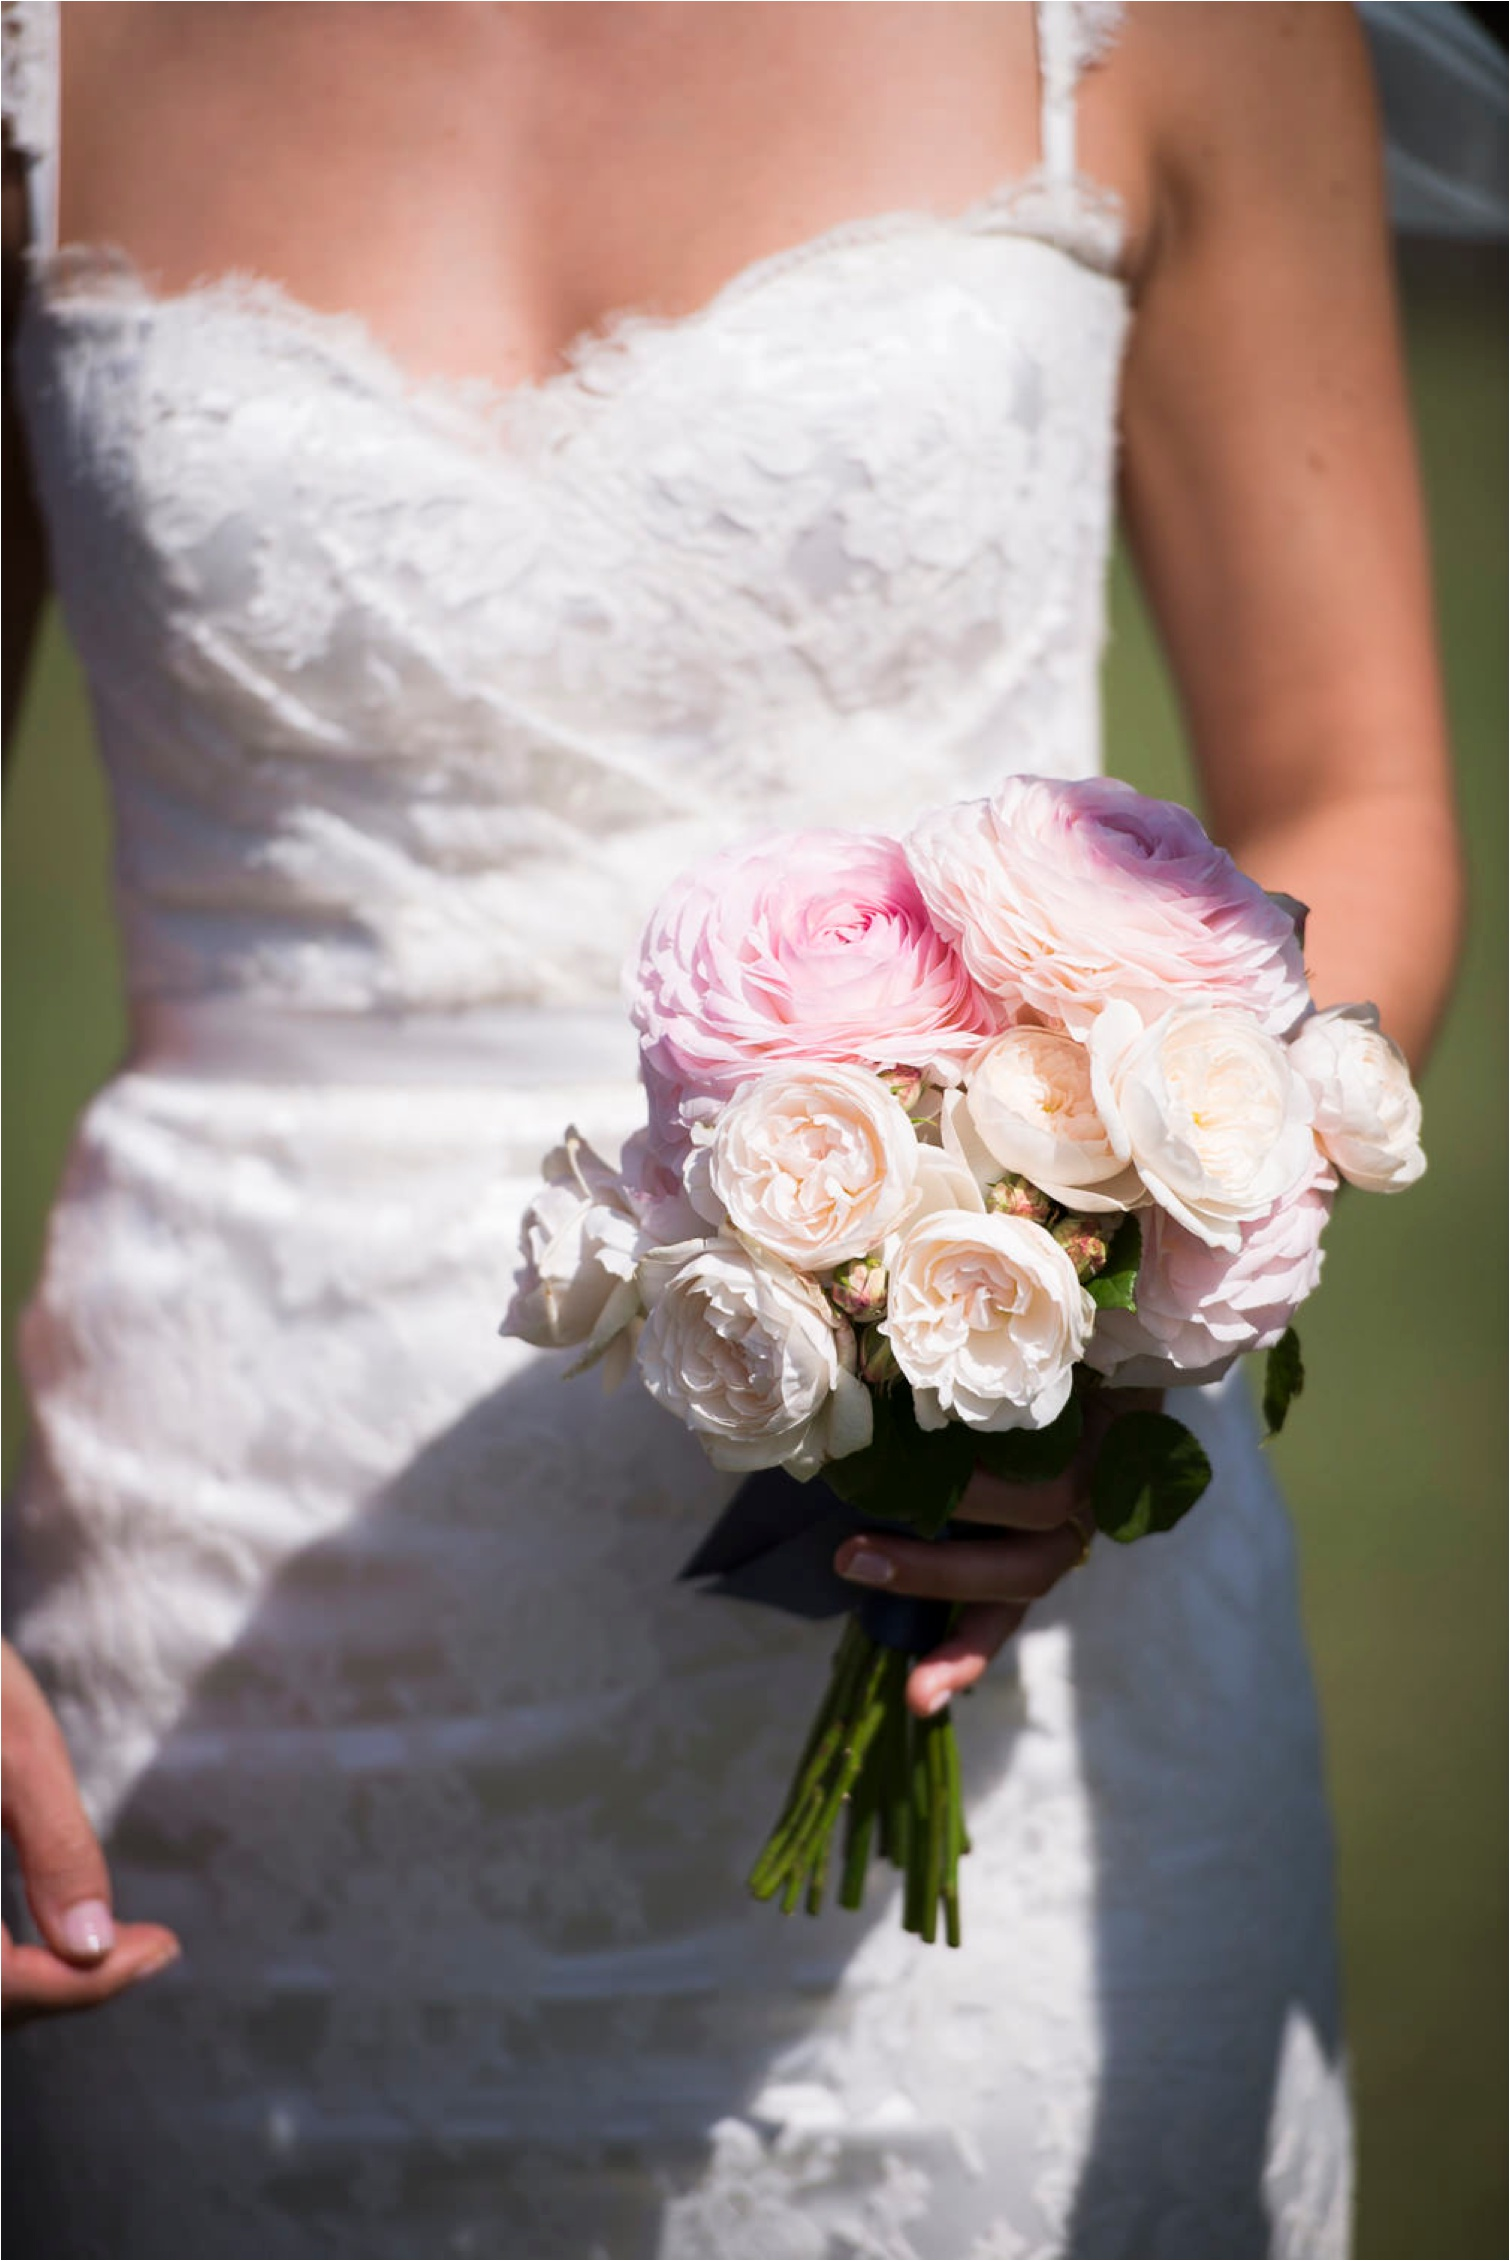 Nicole&Carlie_Watsons_Bay_Hotel_Wedding_by_Gold_Coast_Photographers-The_Follans23.jpg